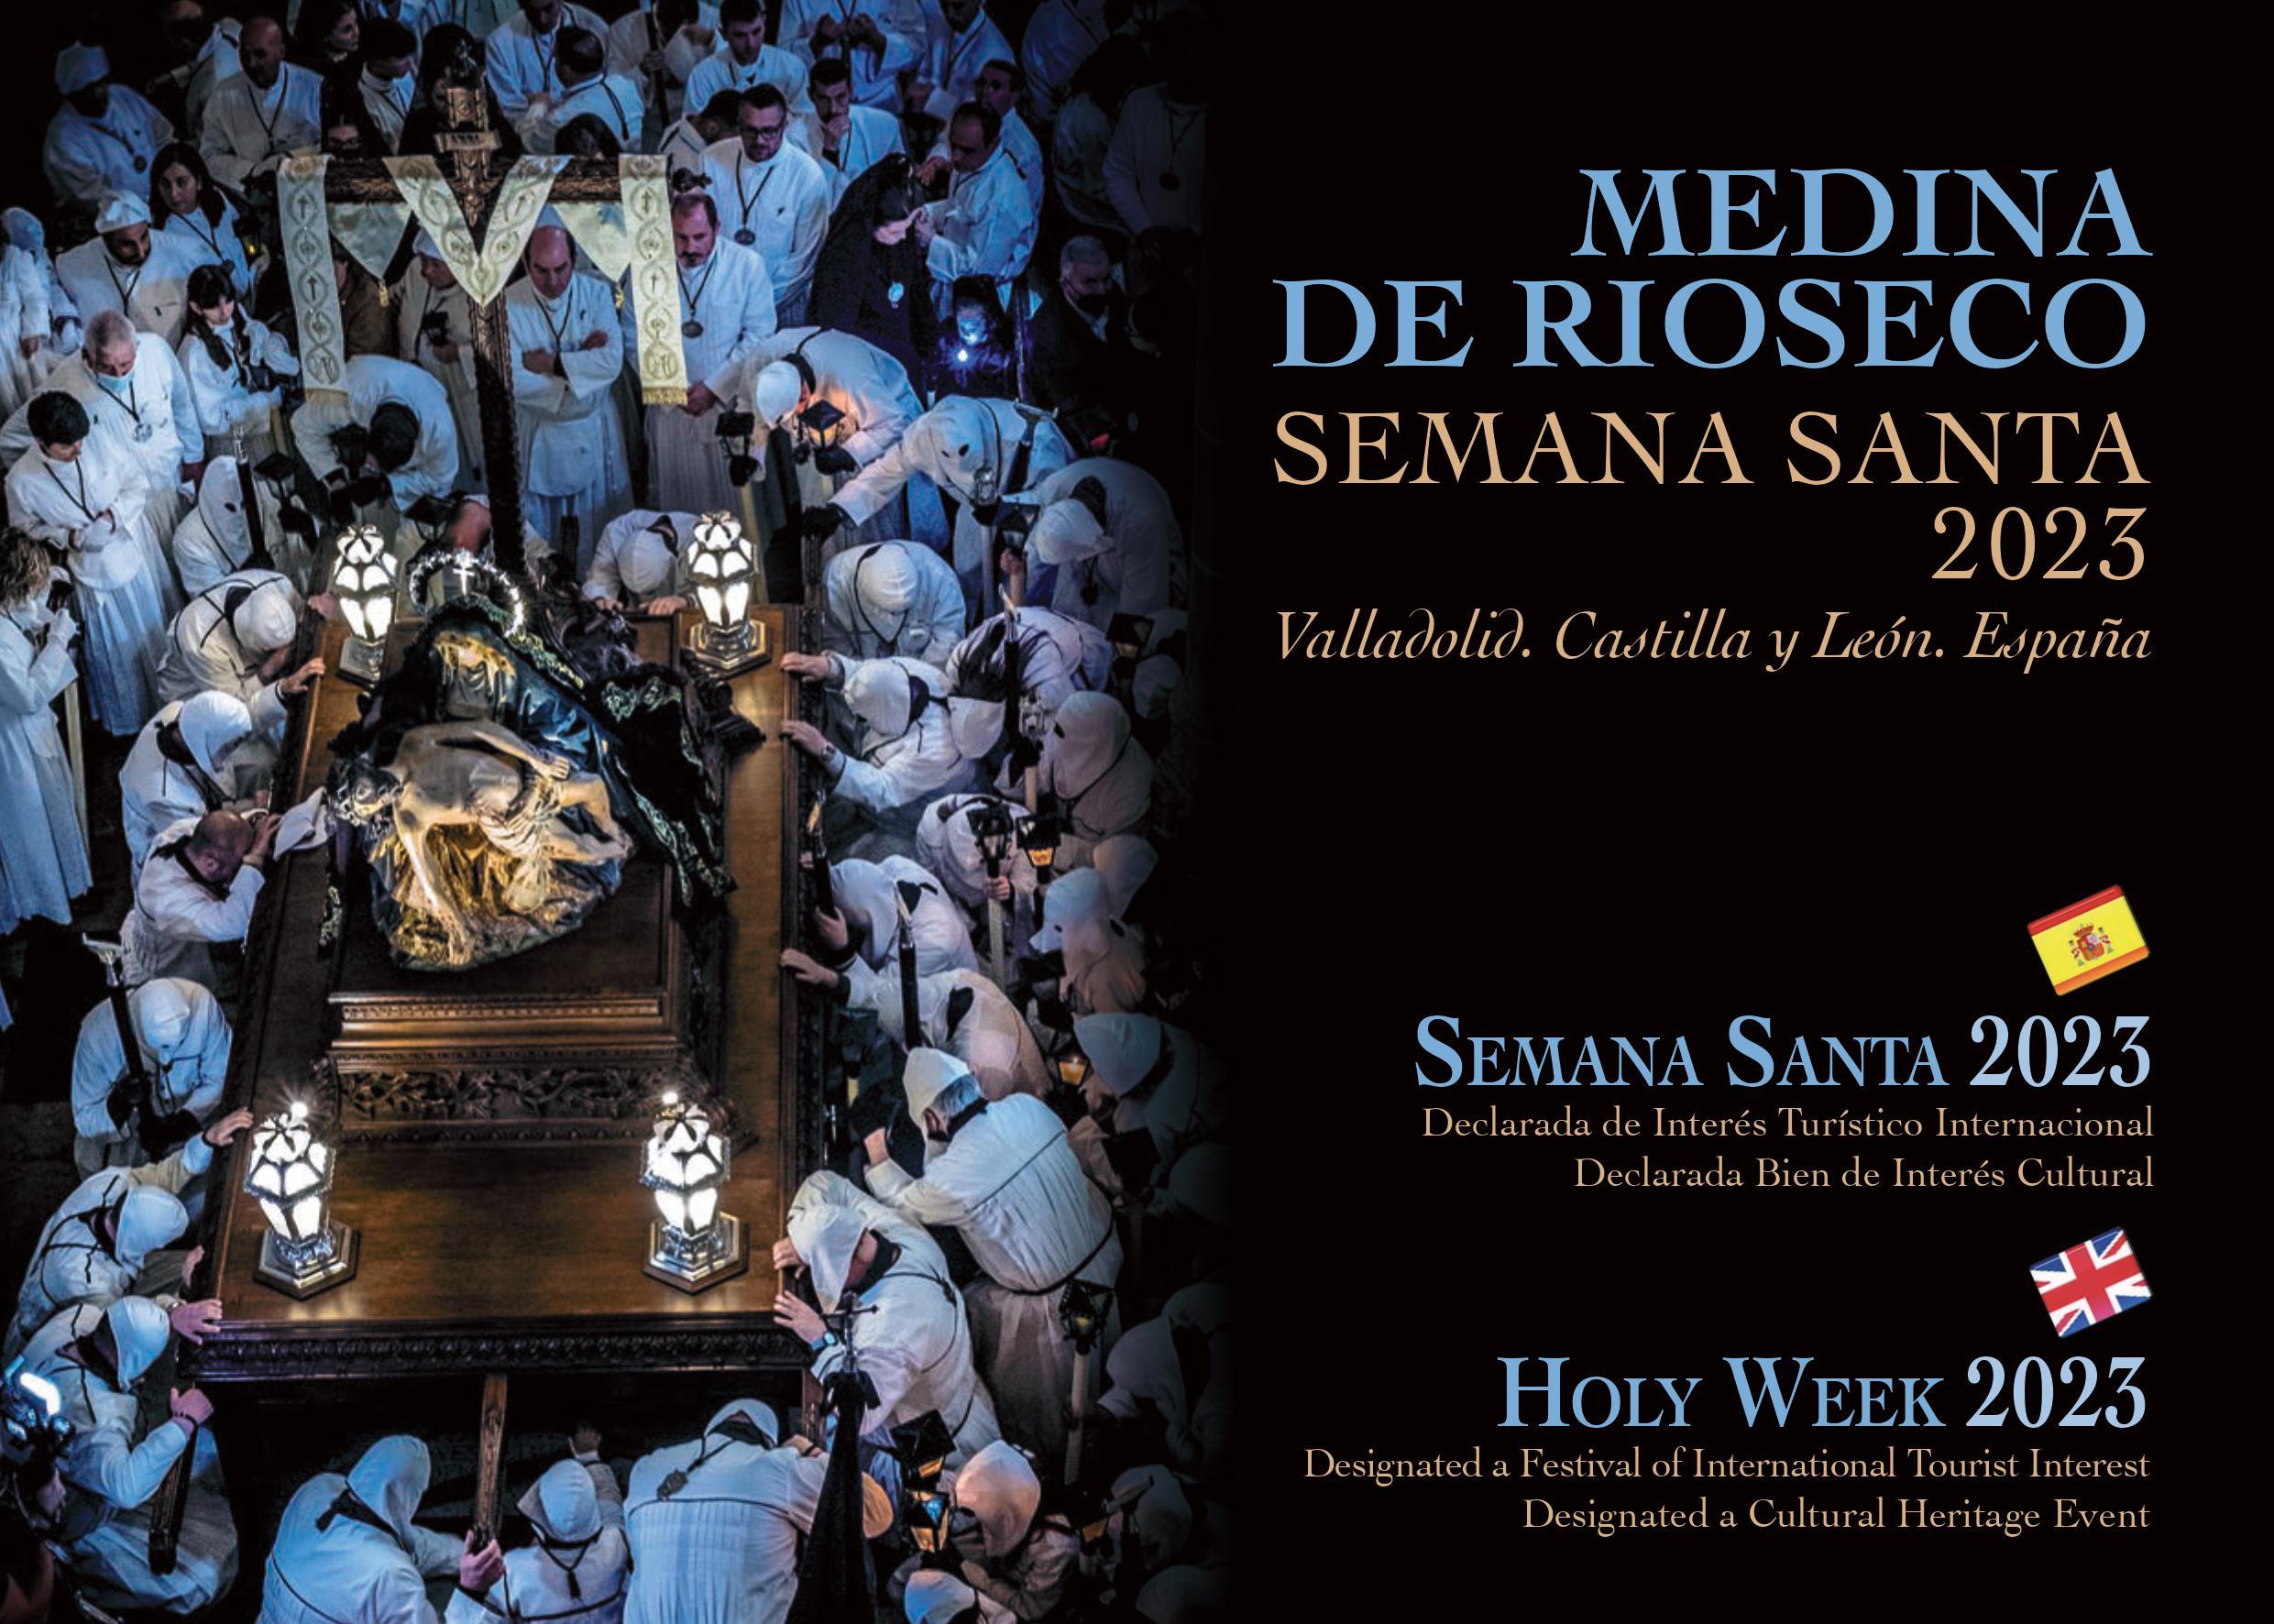 Cartel de la Semana Santa de Medina de Rioseco 2016